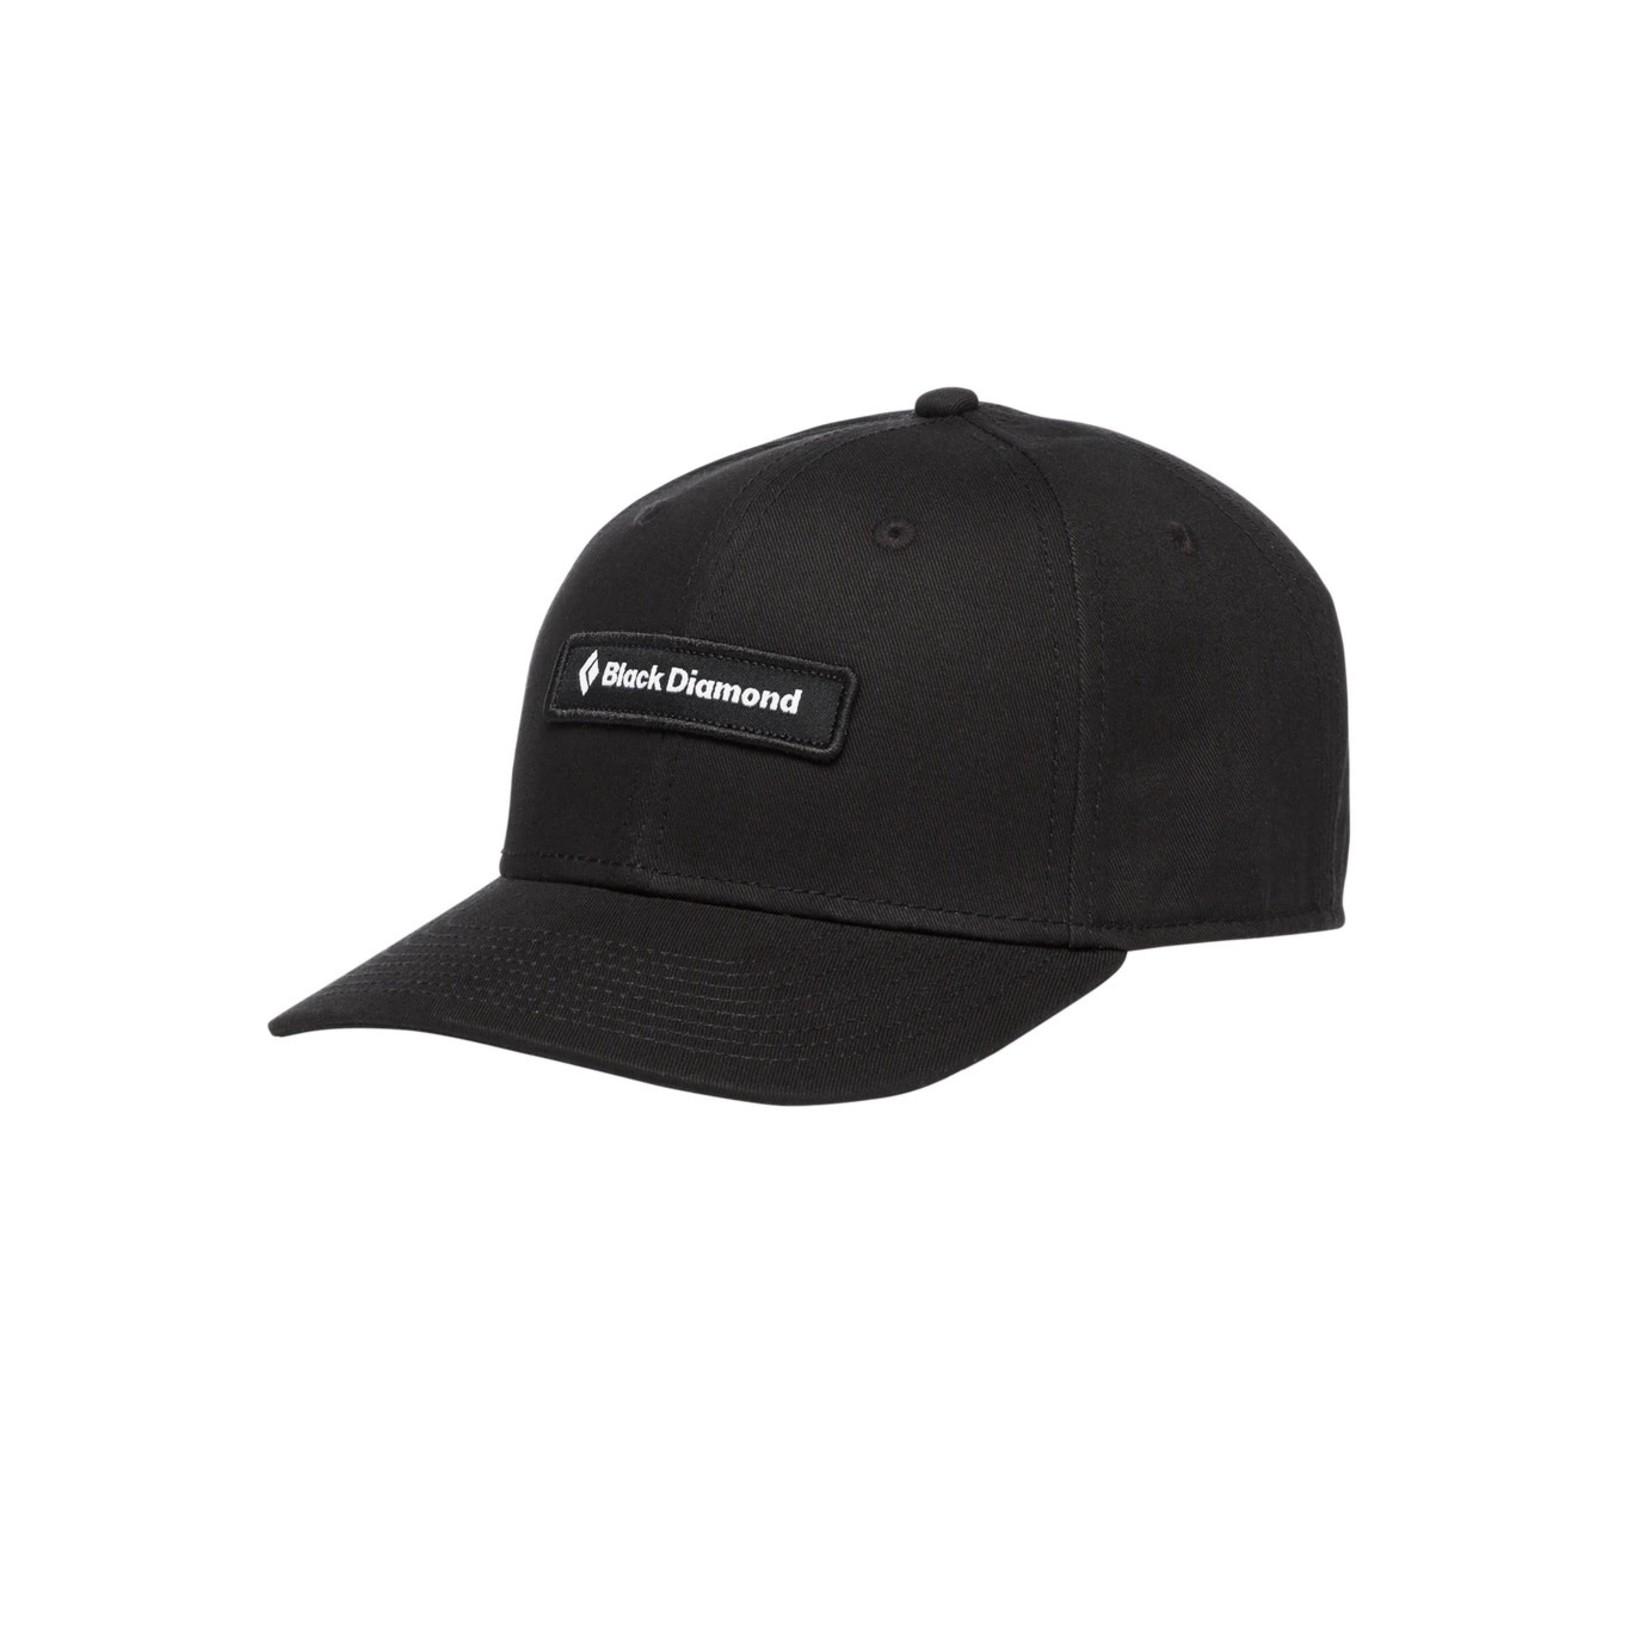 Black Diamond Black Diamond Black Label Hat